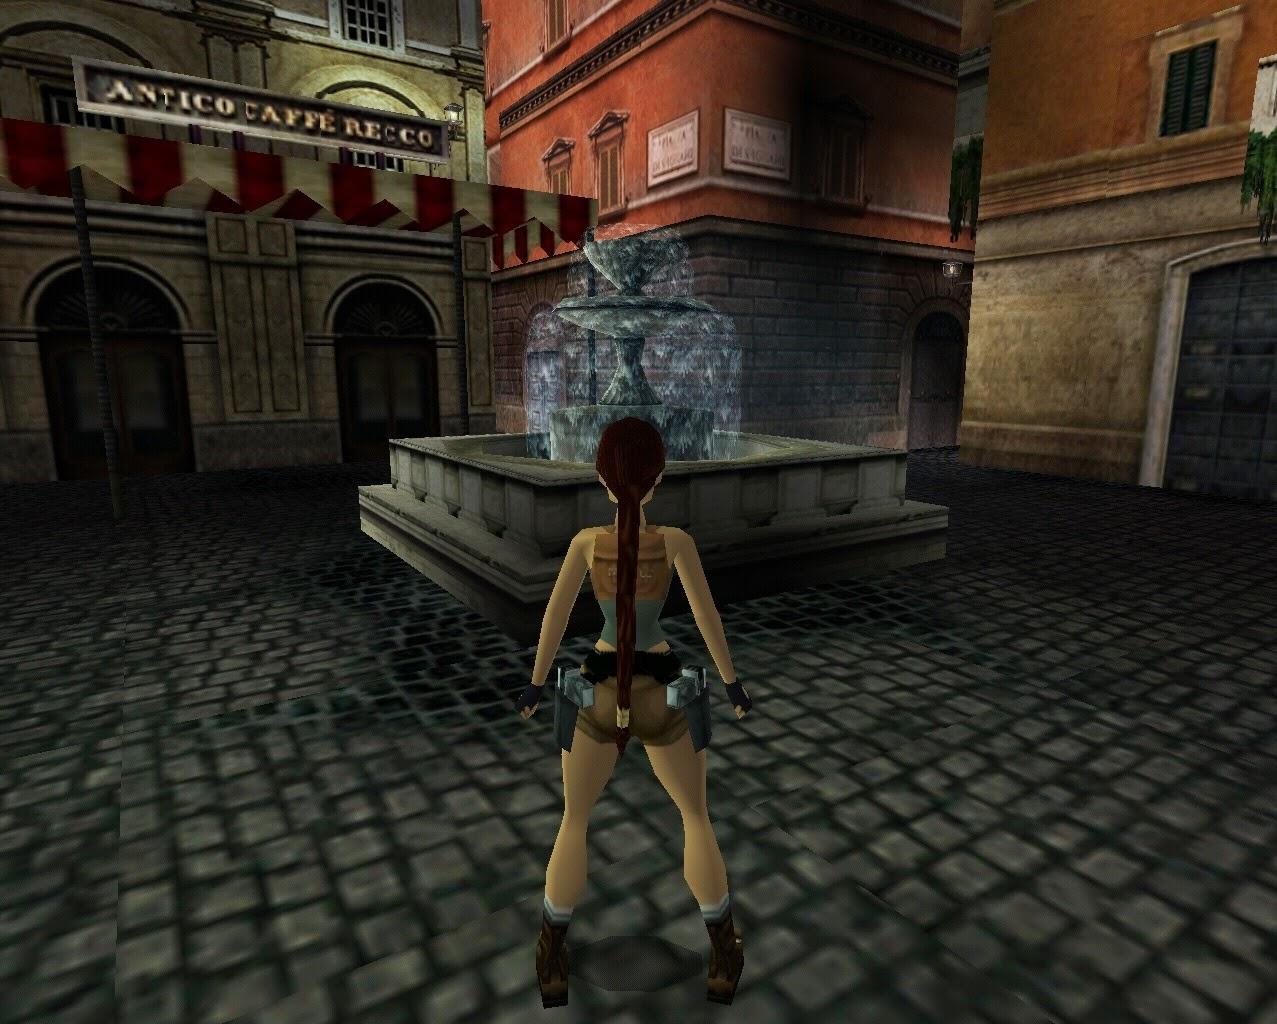 tomb raider video game original